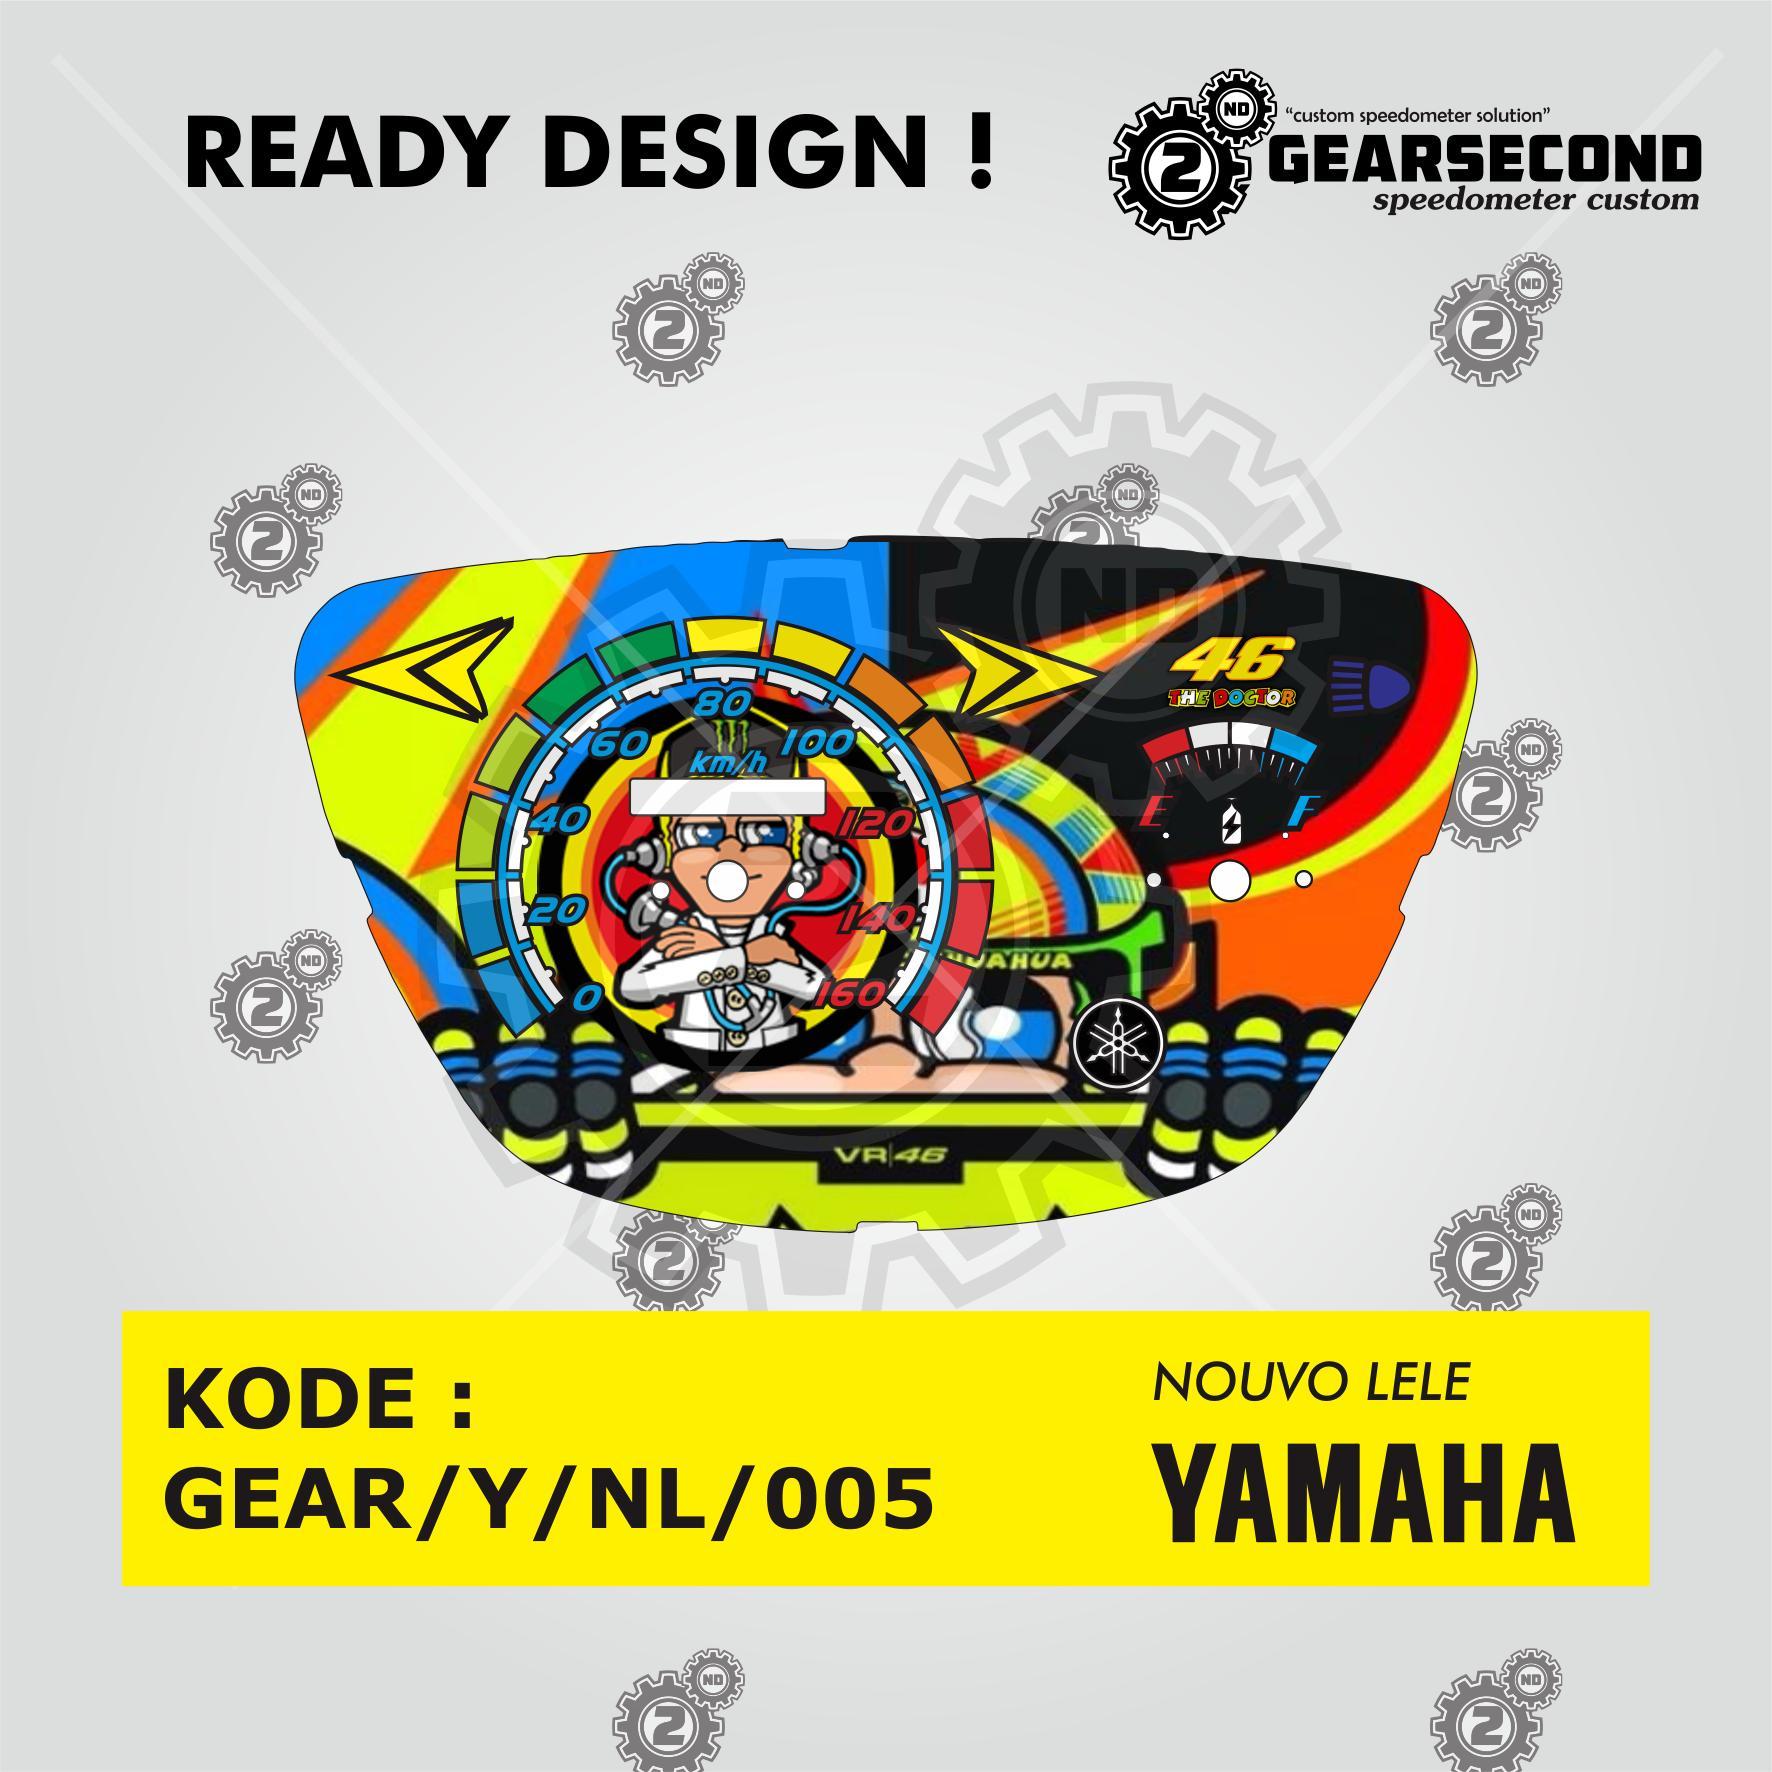 Fitur Ready Design Panel Speedometer Custom Yamaha Nouvo Lele